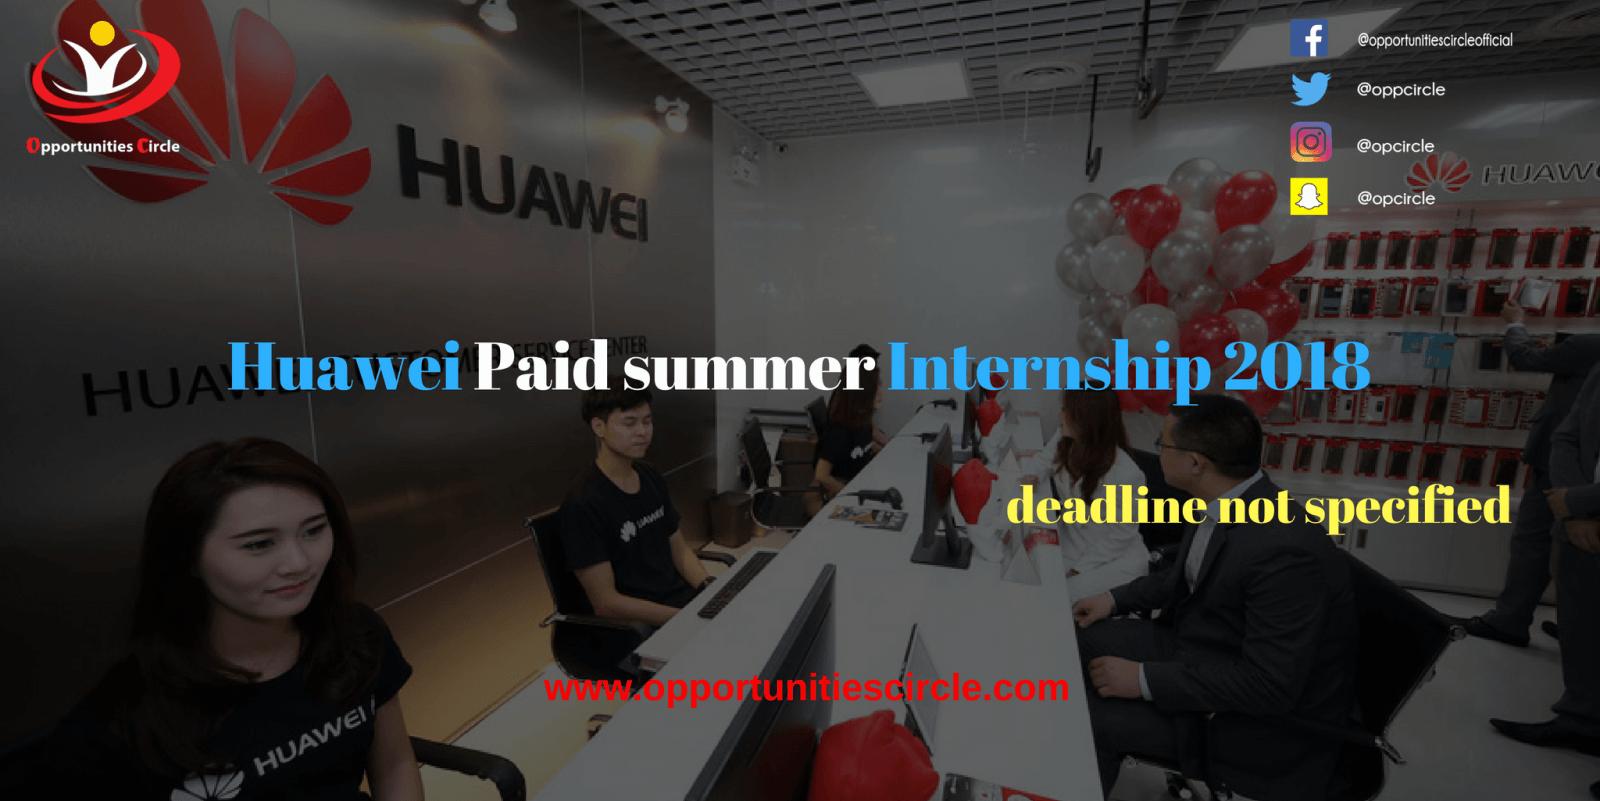 Huawei Paid summer Internship 2018 - Opportunities Circle